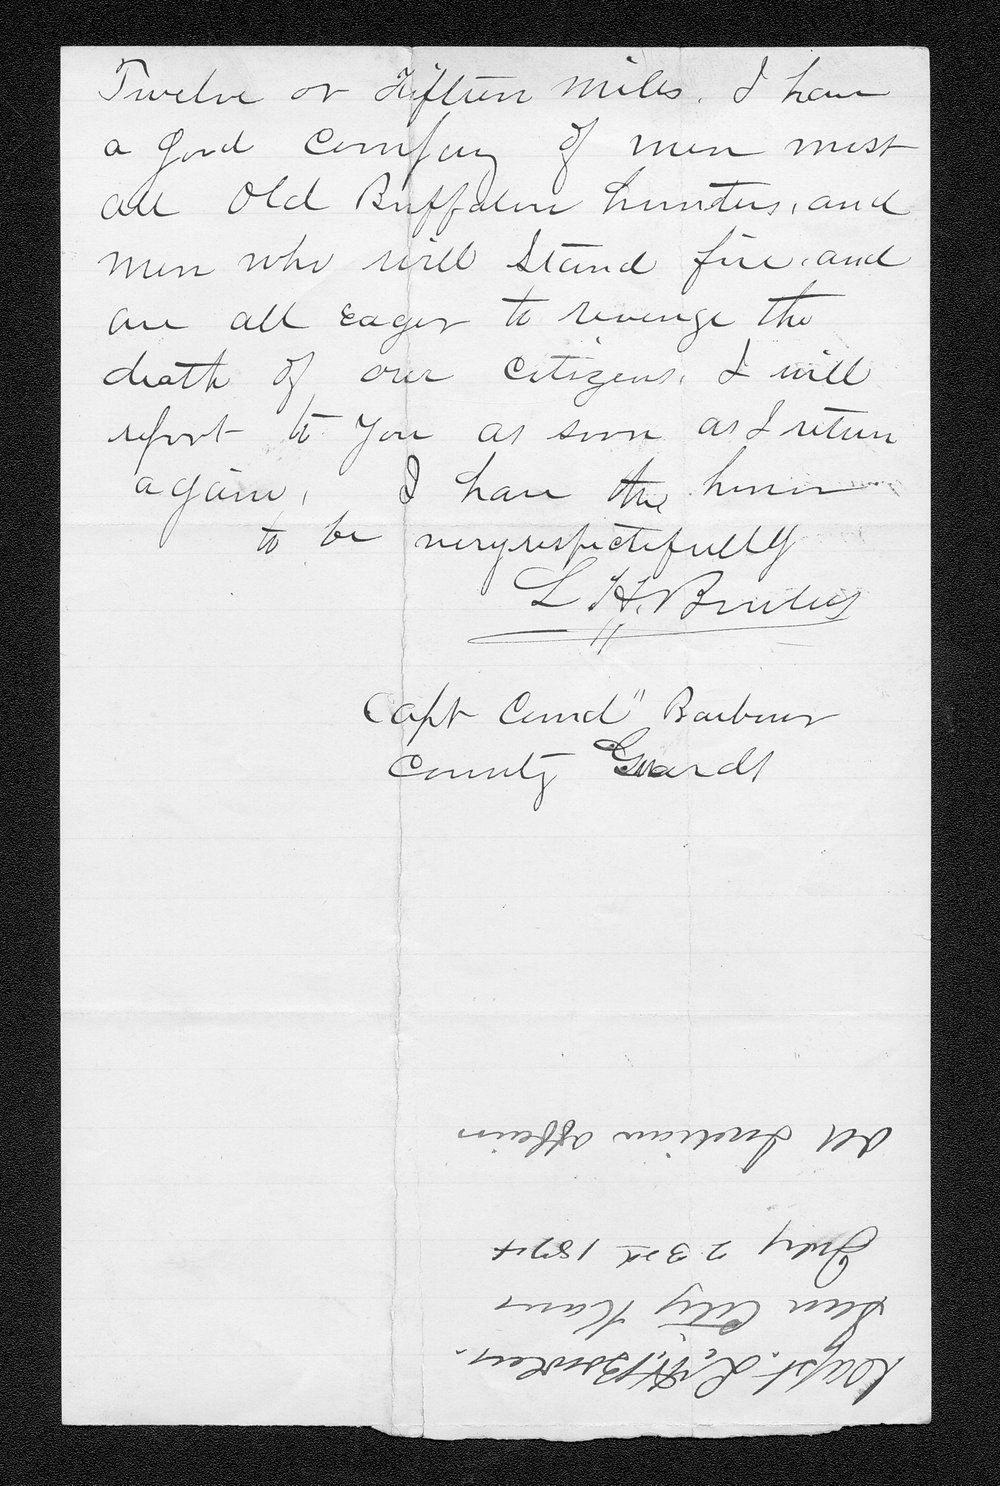 Governor Thomas Osborn Indian affairs received correspondence - 6